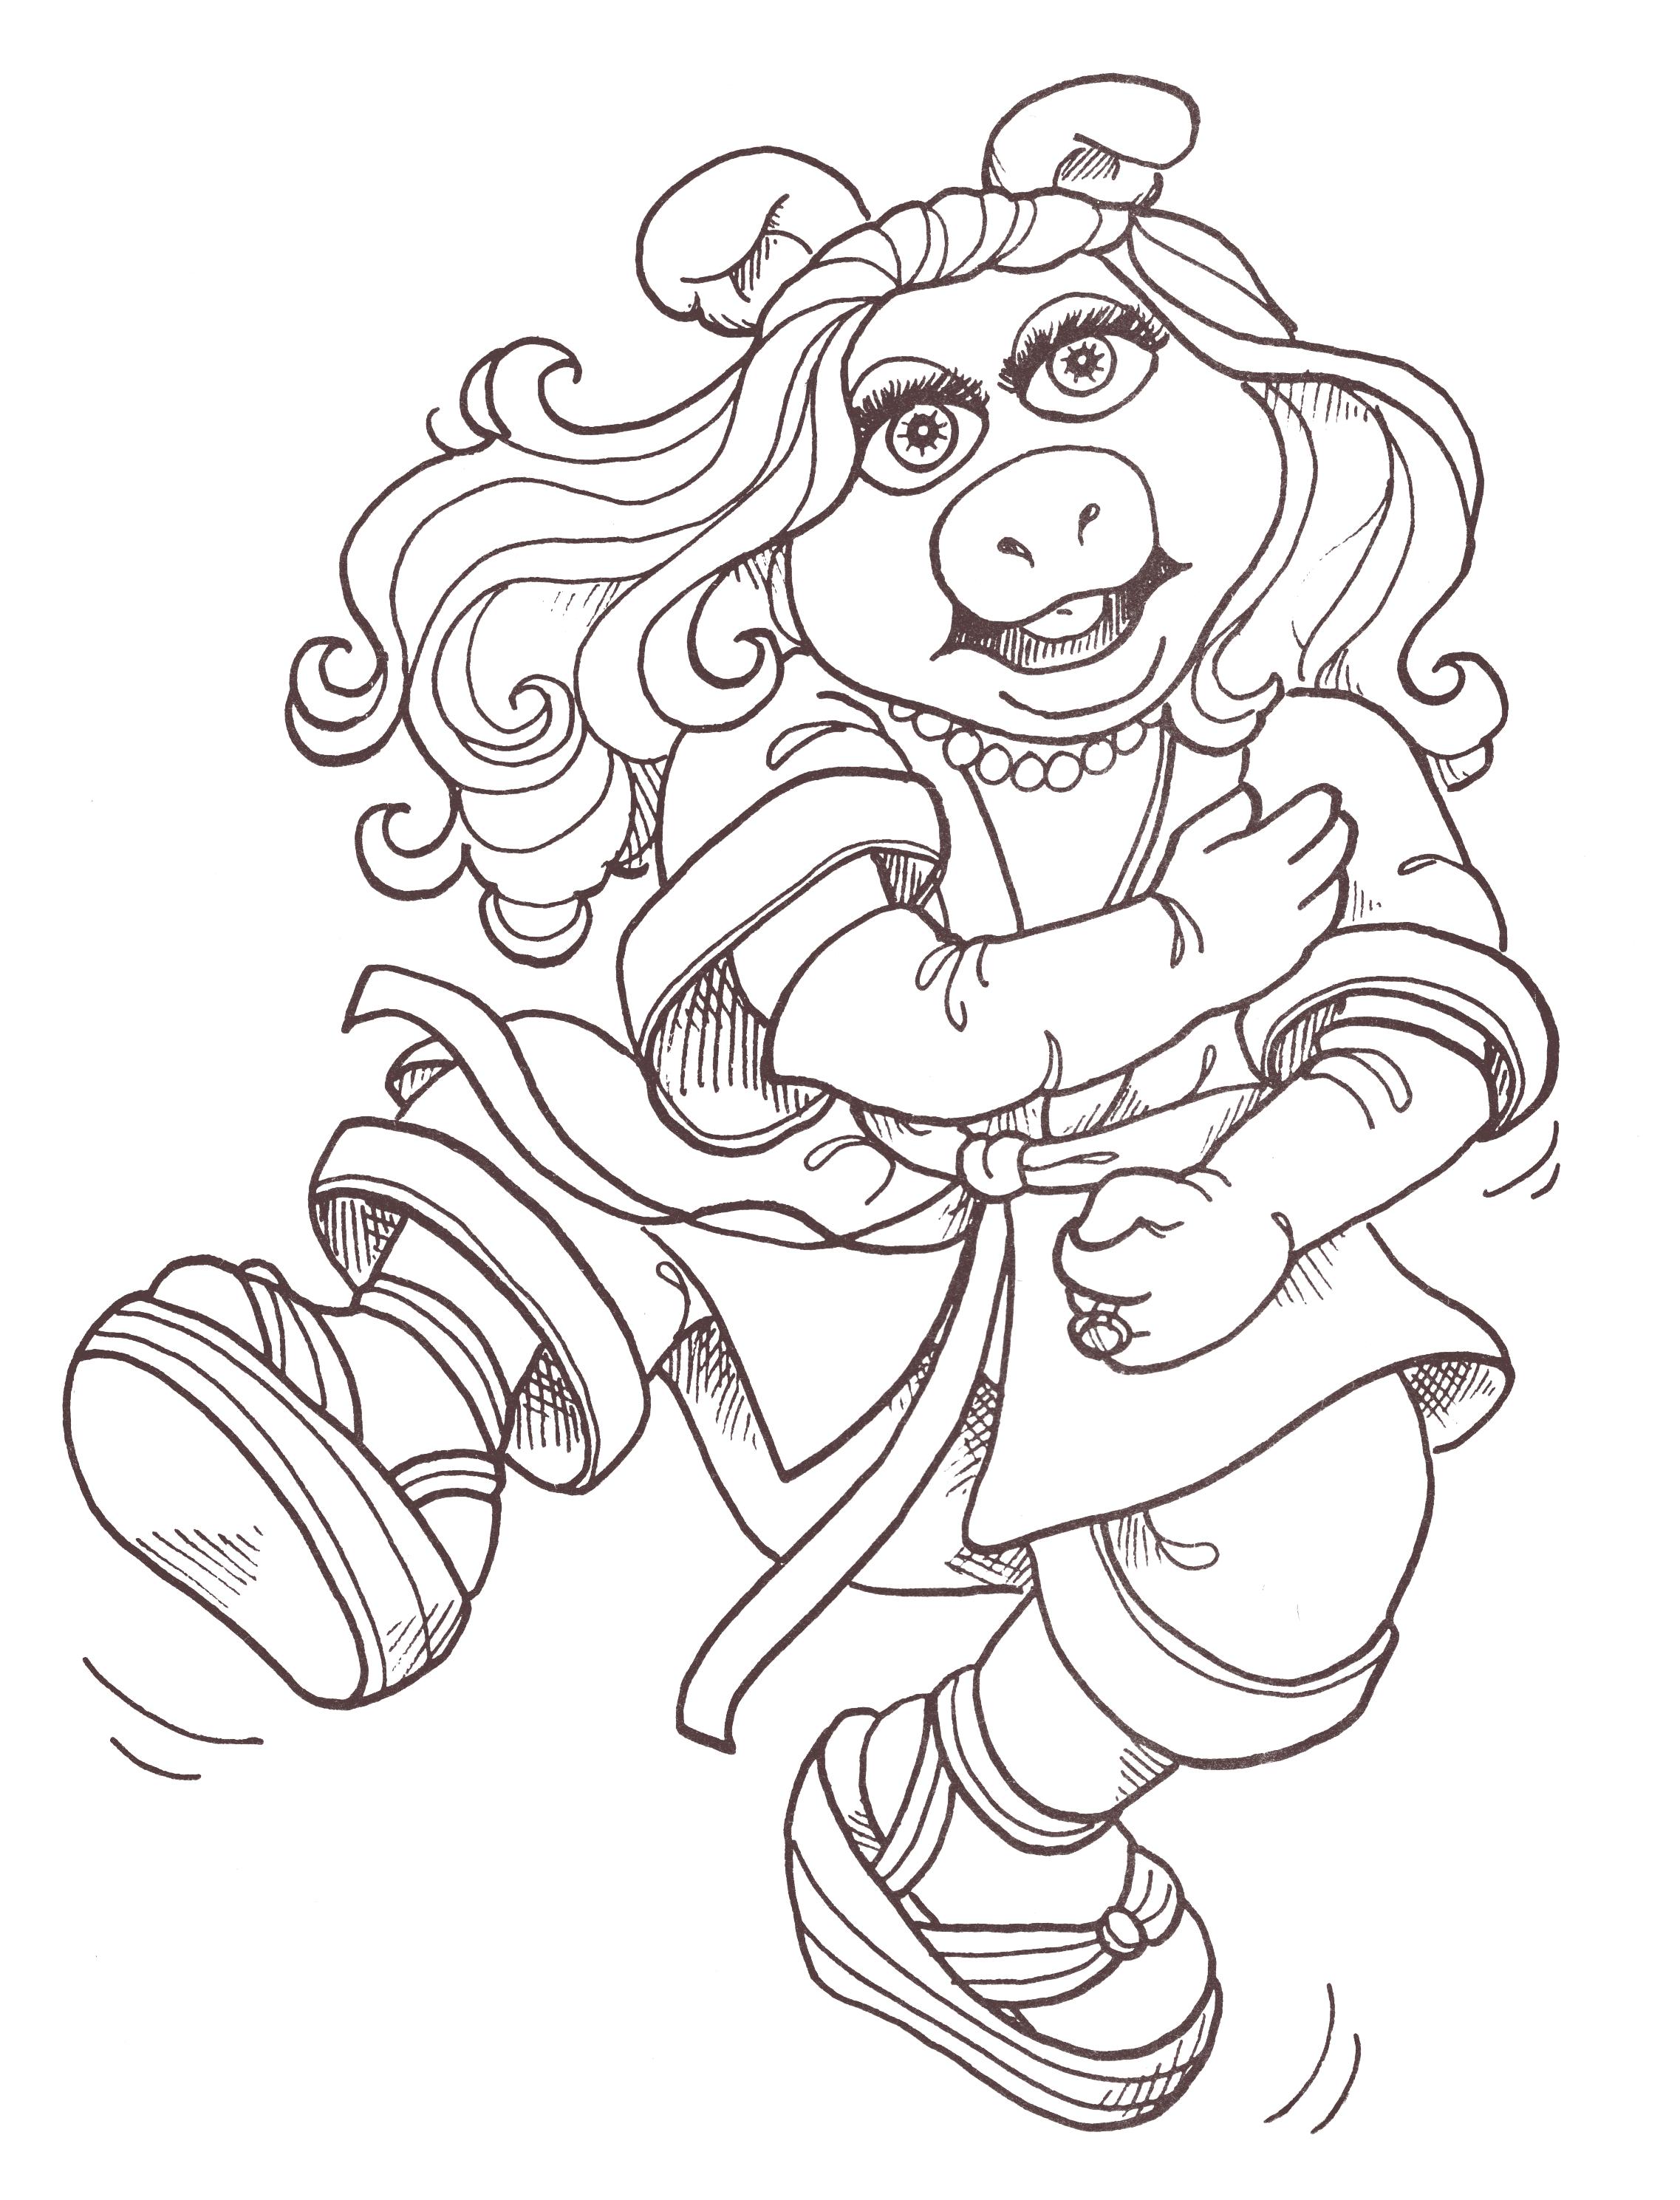 Miss Piggy\'s karate chops | Muppet Wiki | FANDOM powered by Wikia